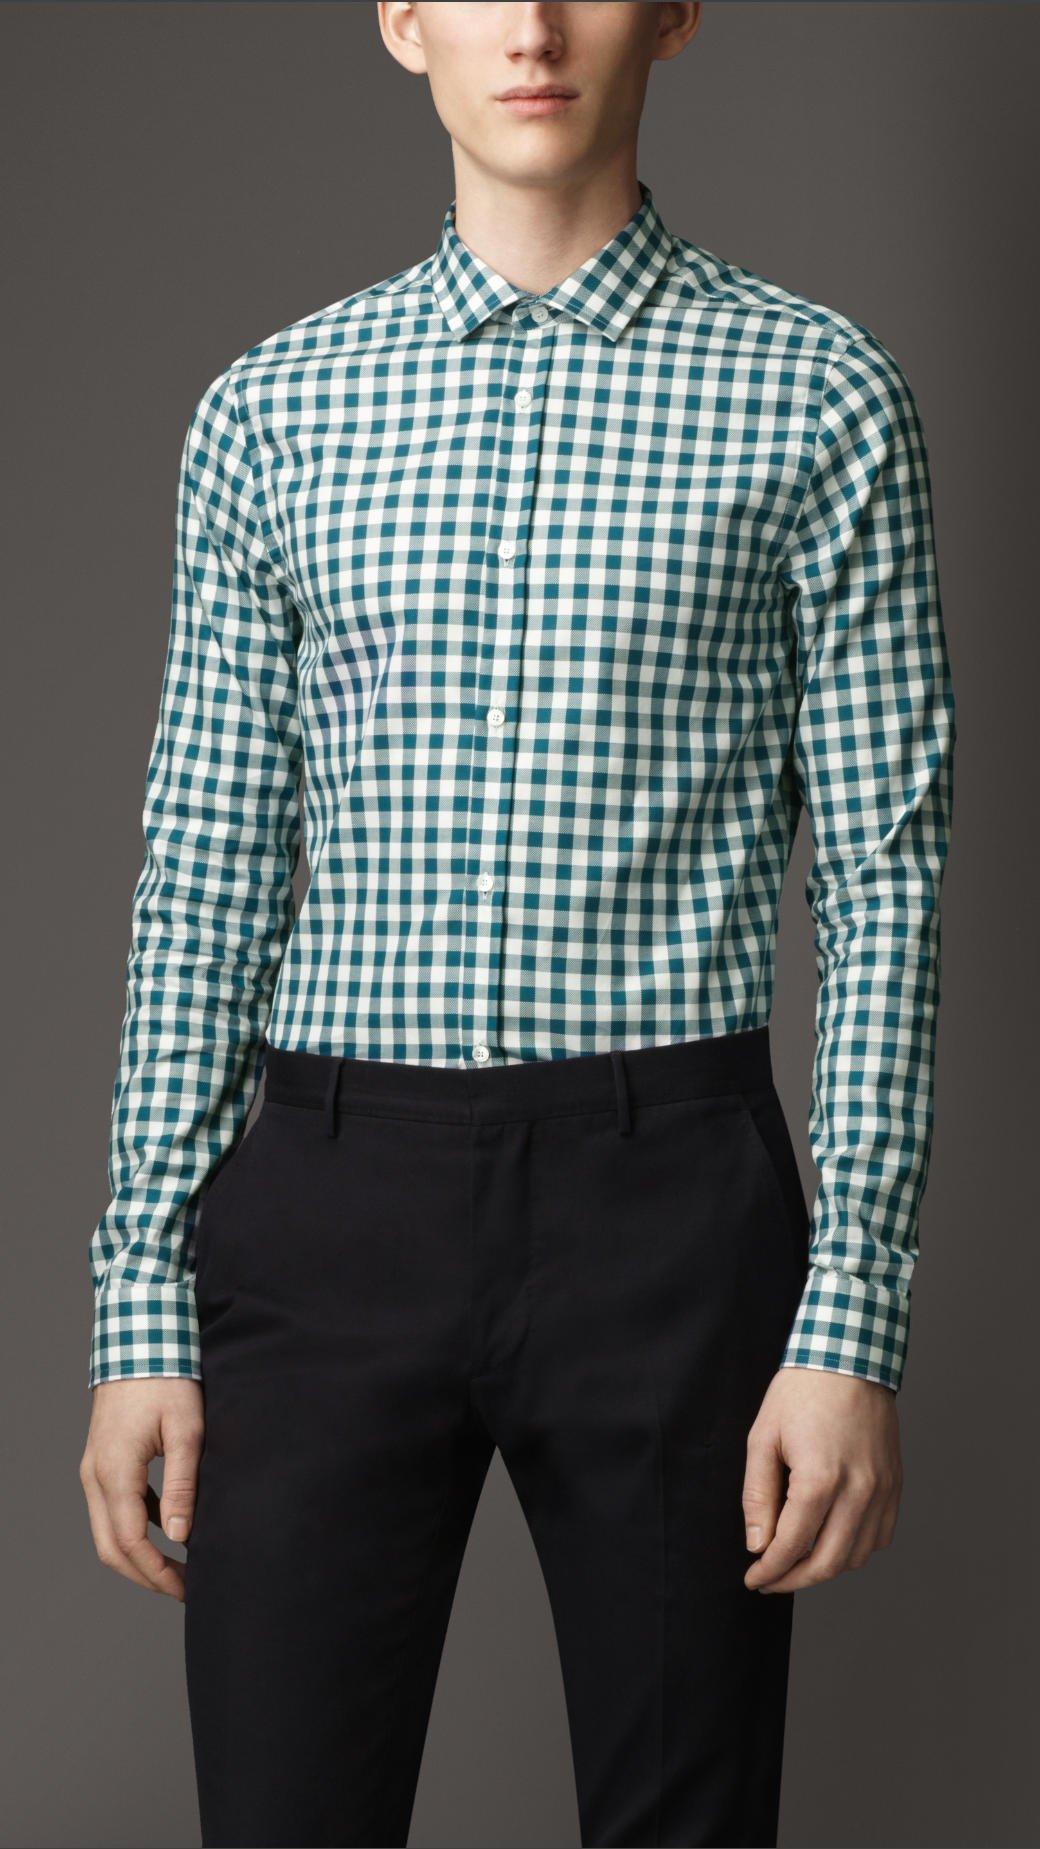 Tommy Hilfiger Women S T Shirts